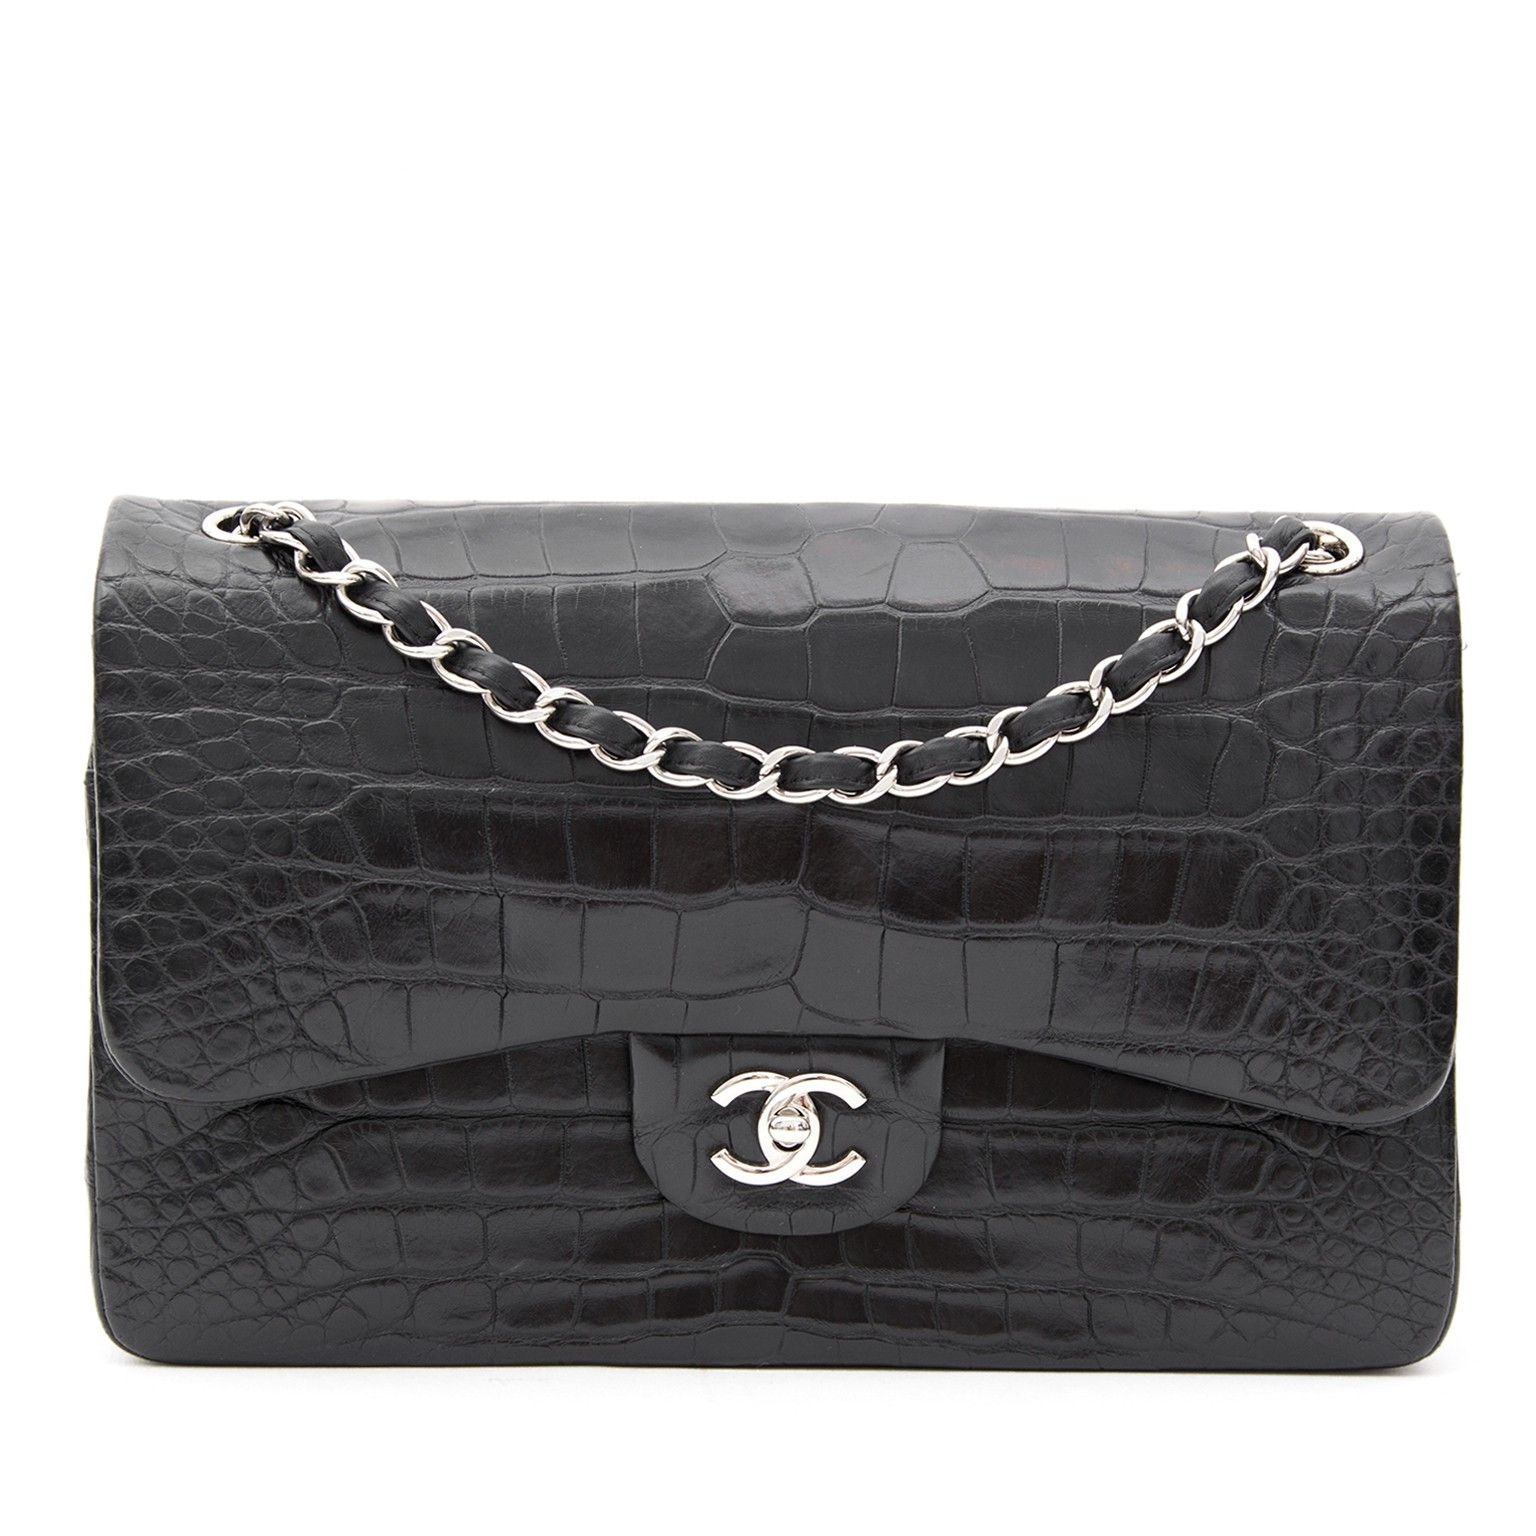 be99a9a816f3 Chanel Alligator Jumbo Double Flap Black | We LOV Chanel